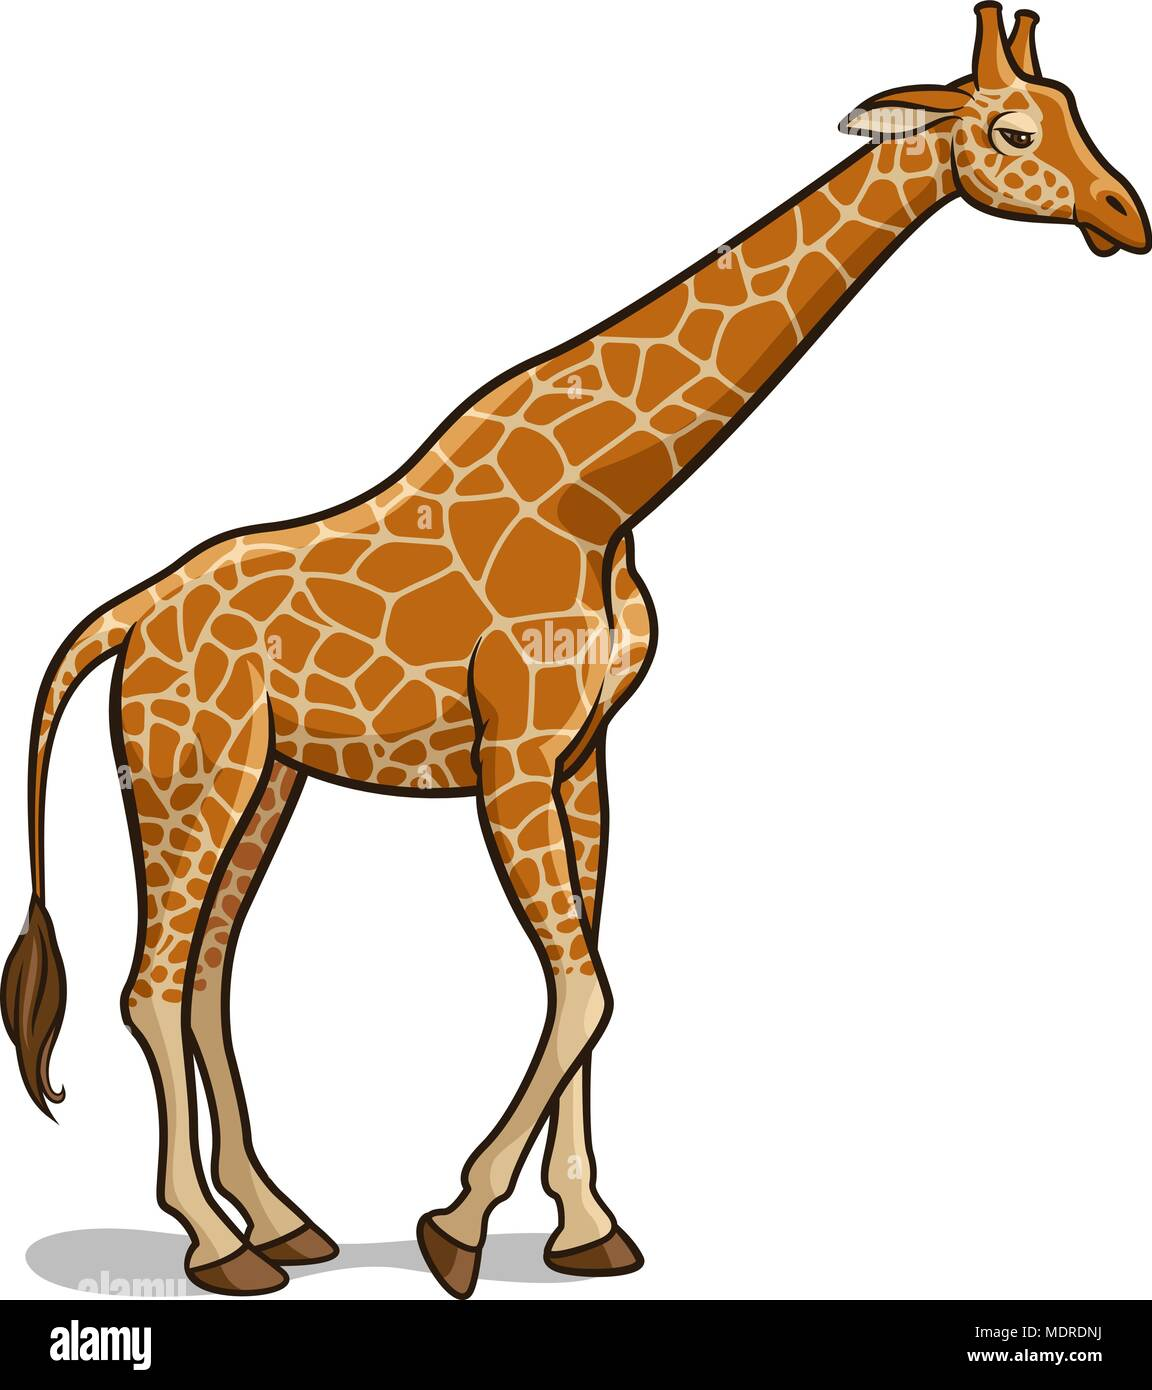 Giraffe Cartoon Stock Vector Images - Alamy - photo#39